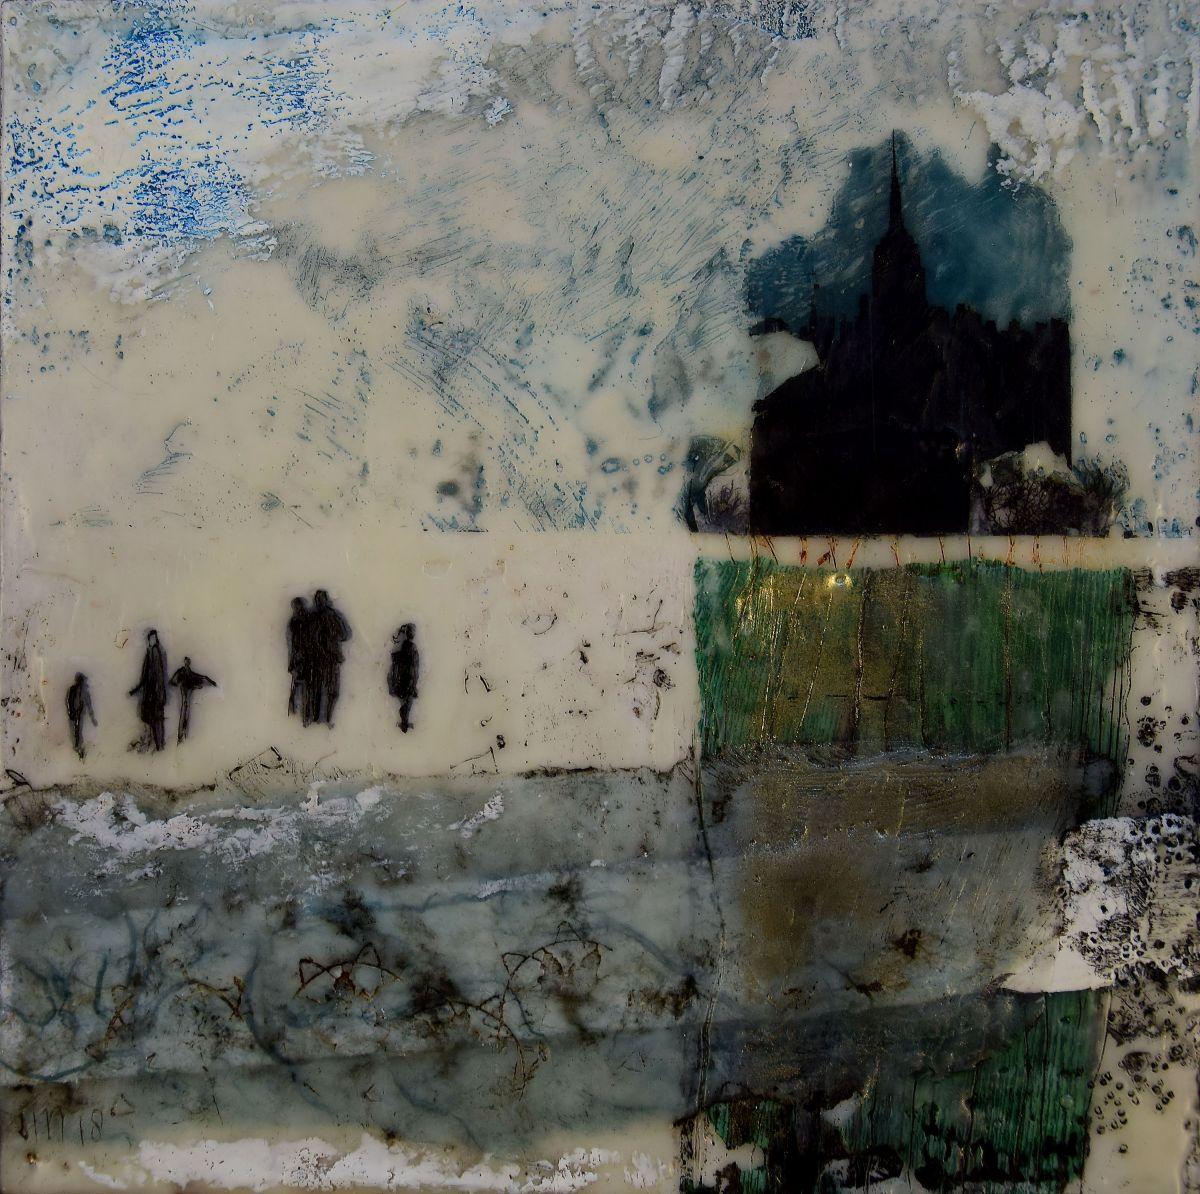 Kunst: Grote stad van kunstenaar Trijnie Mohlmann